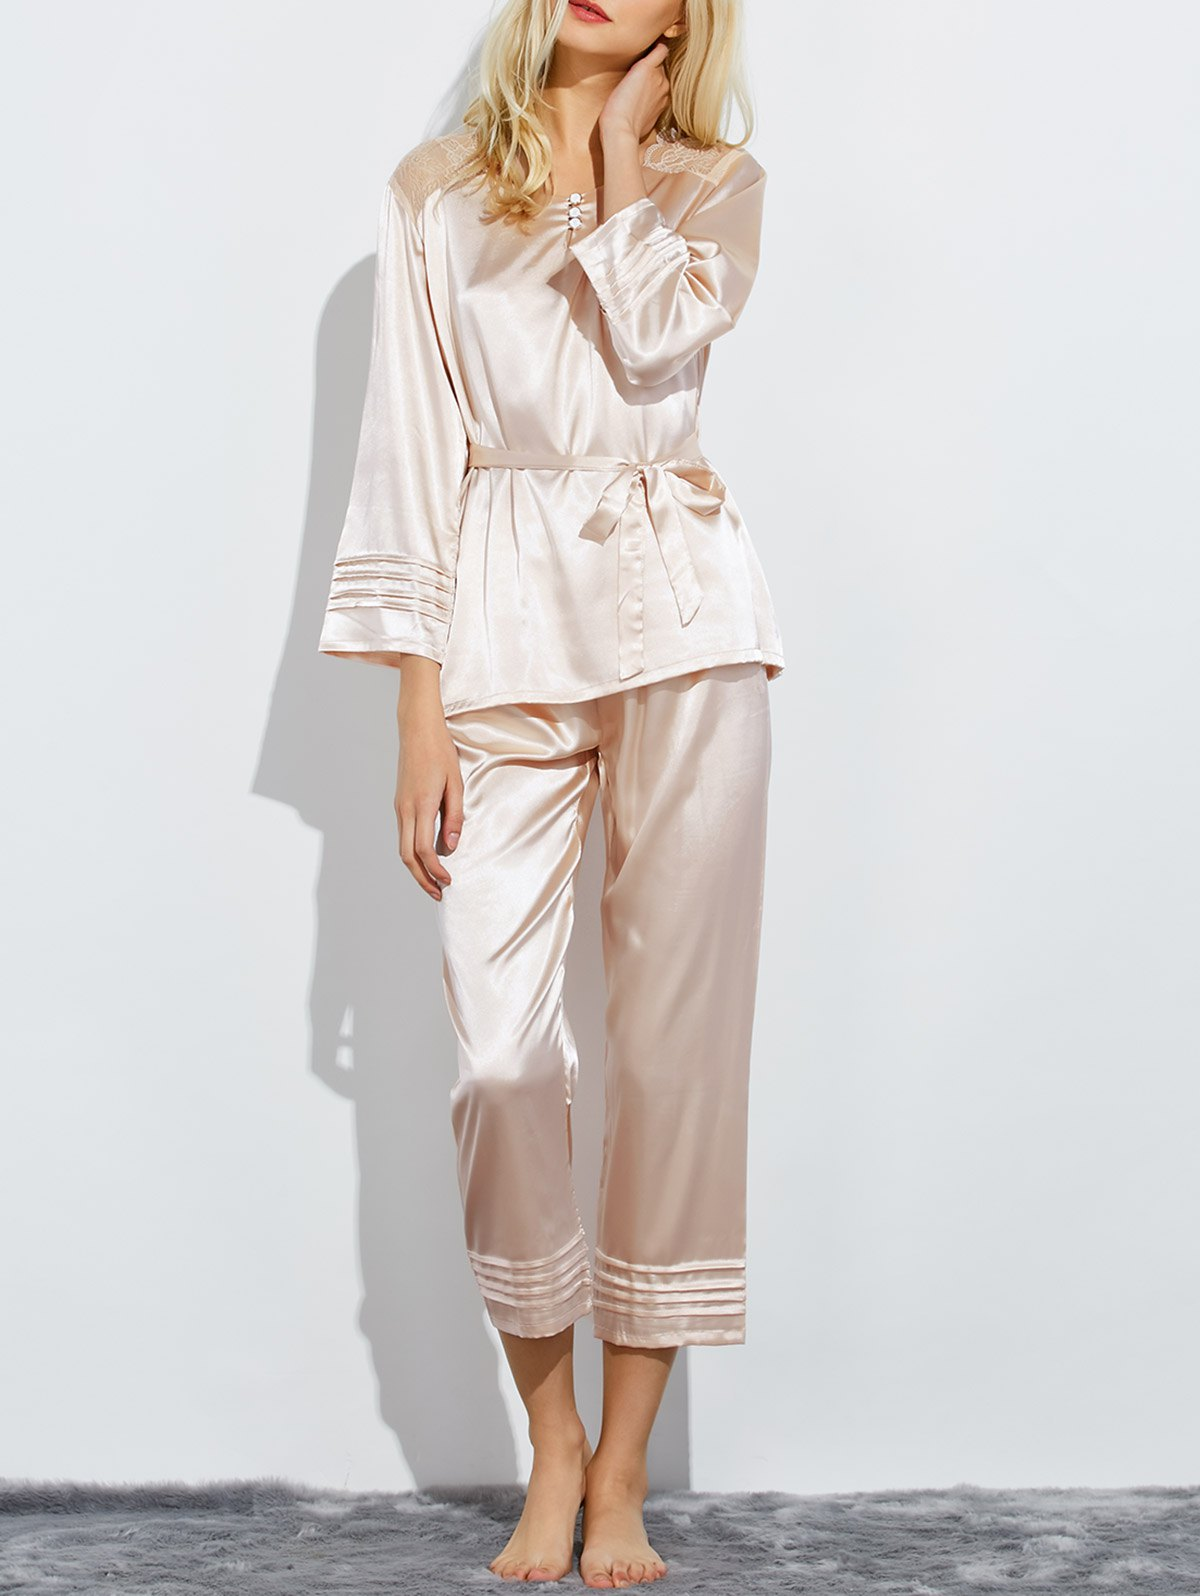 Belted Lace Panel Nightwear Pajamas